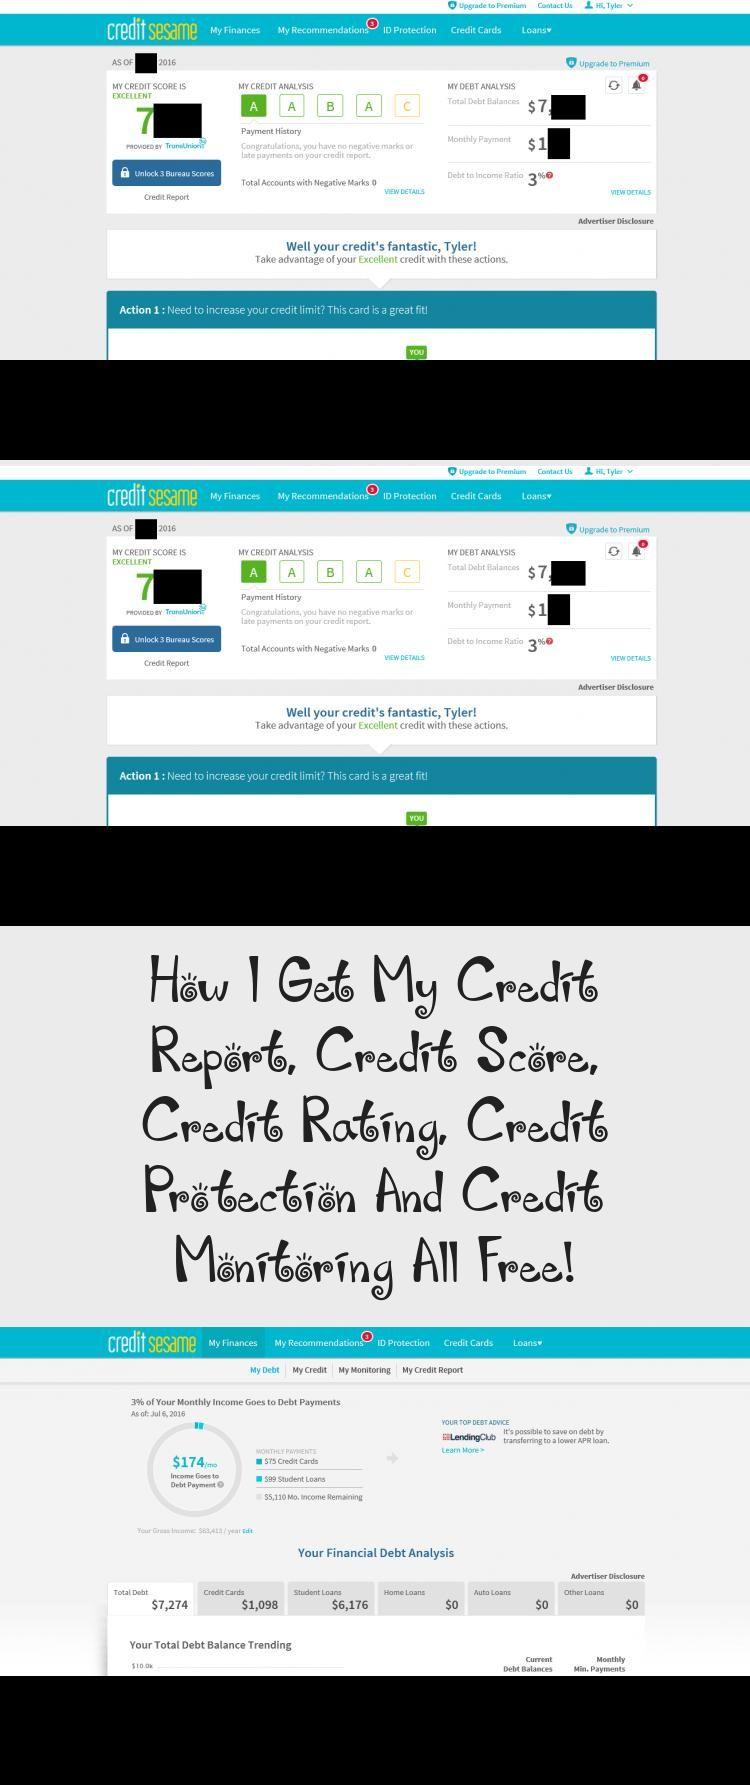 How I Get My Credit Report, Credit Score, Credit Rating